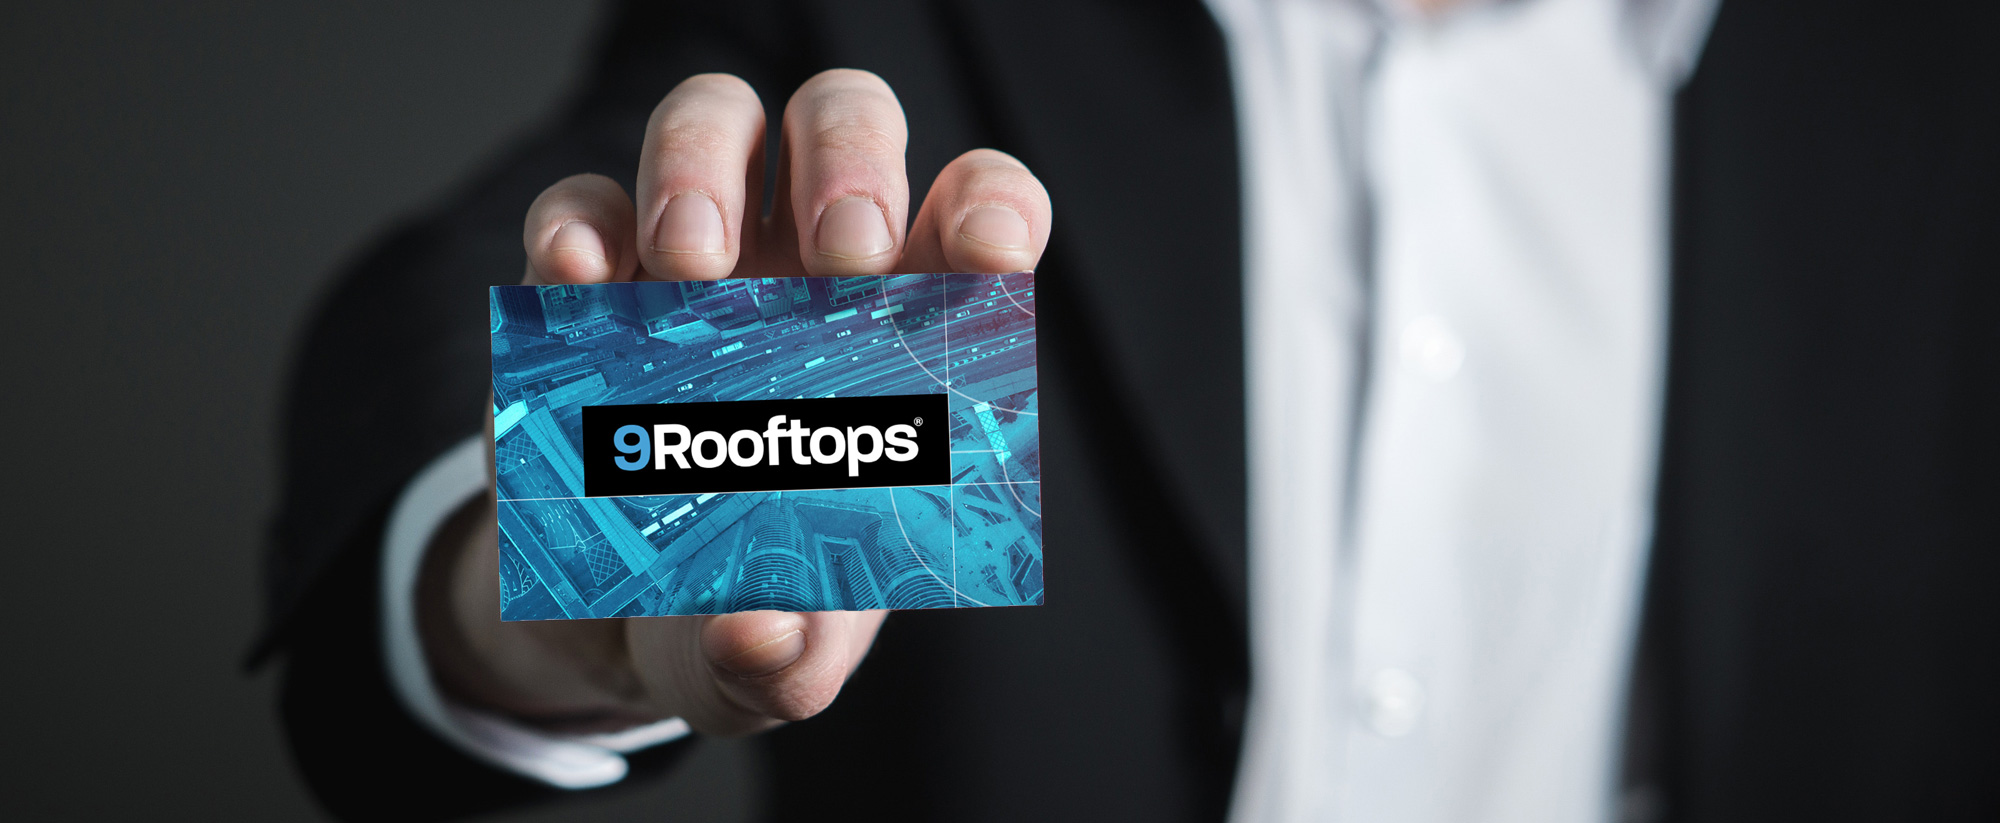 Three Established Agencies Merge to Form 9Rooftops